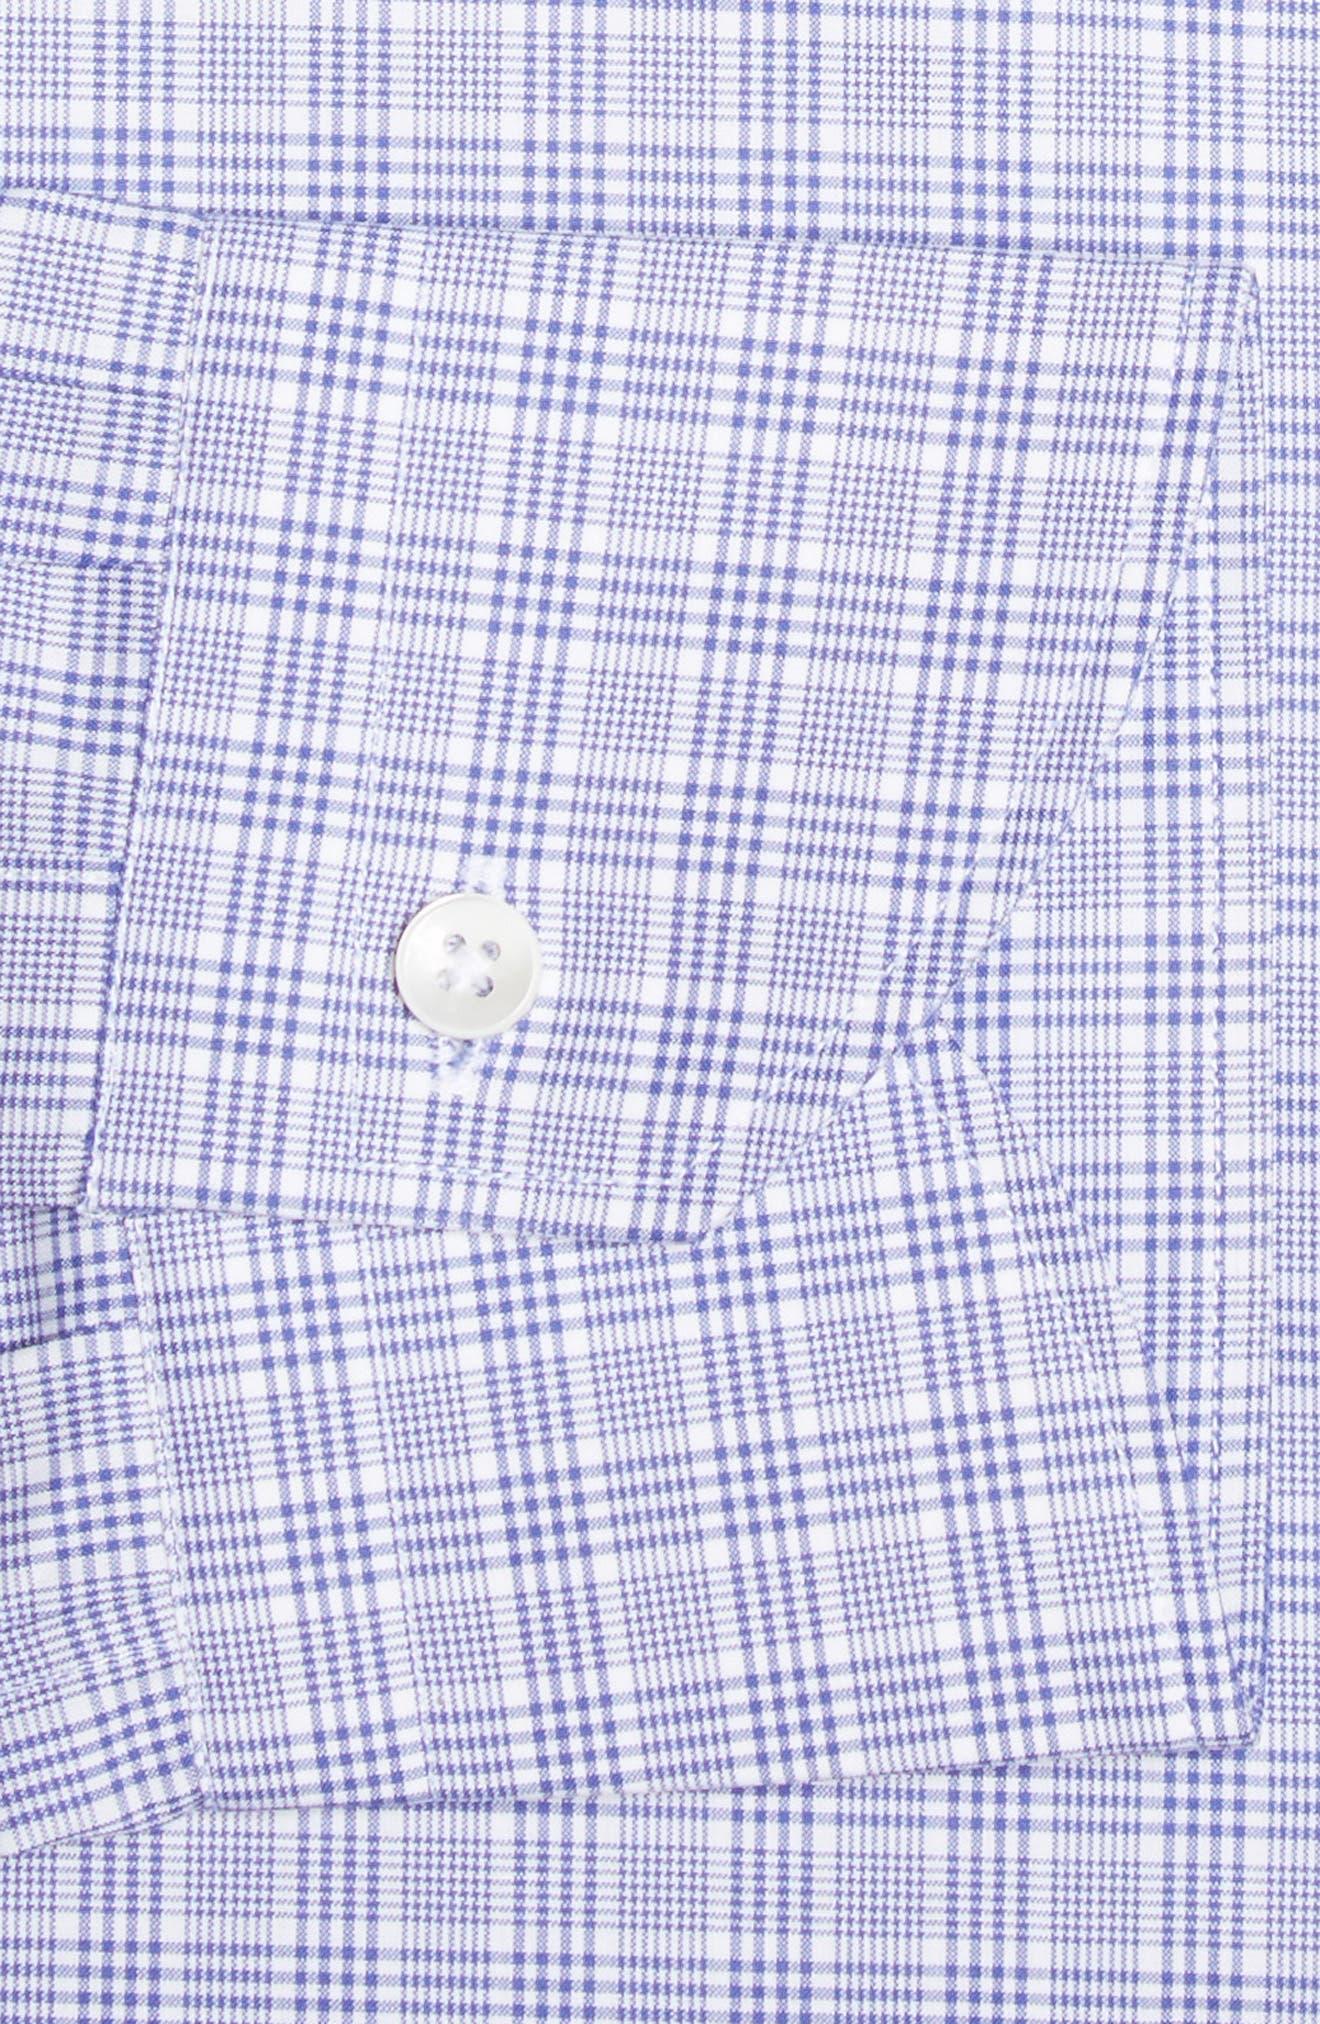 Regular Fit Plaid Dress Shirt,                             Alternate thumbnail 4, color,                             450